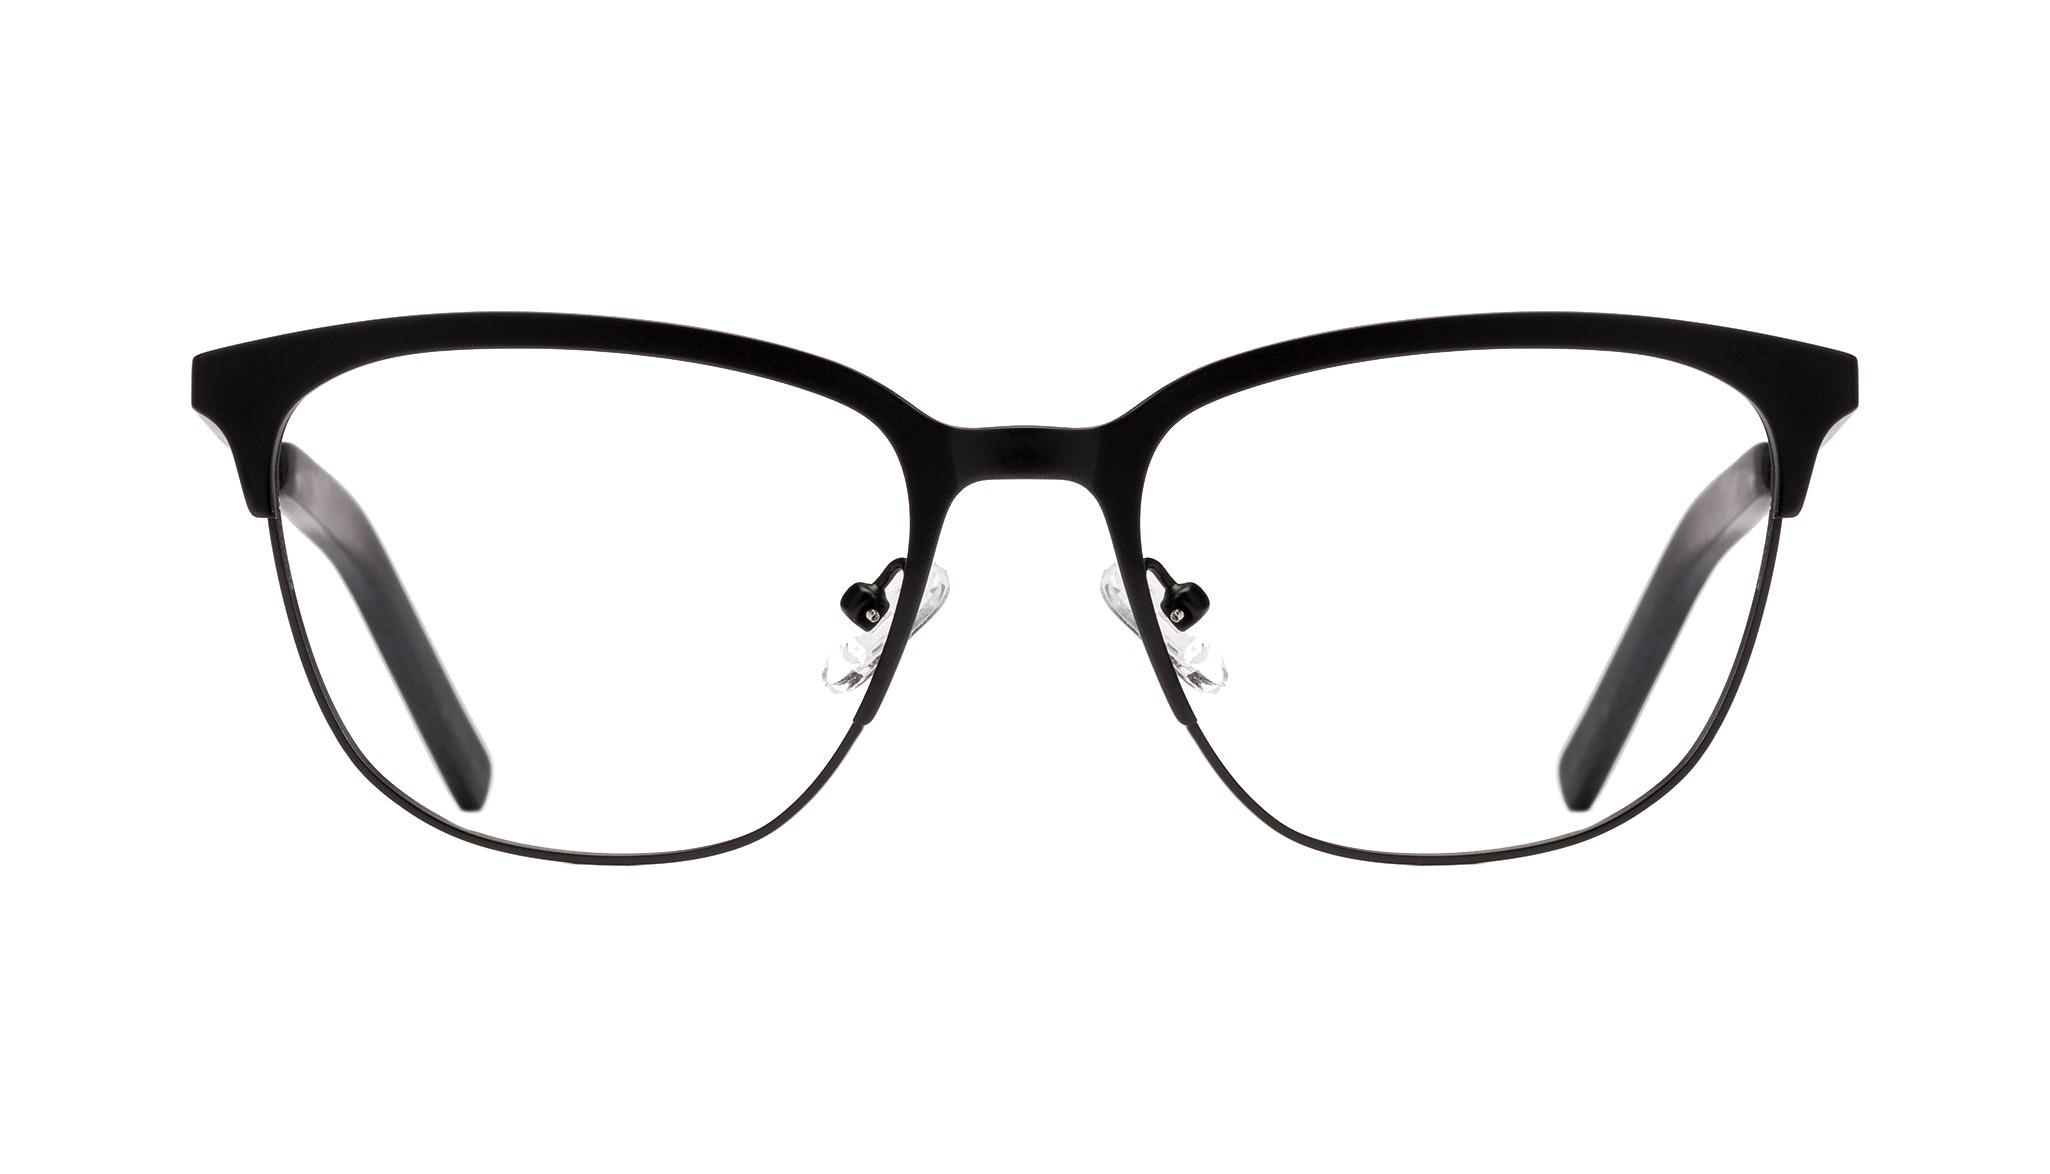 Affordable Fashion Glasses Rectangle Eyeglasses Men Legacy Black